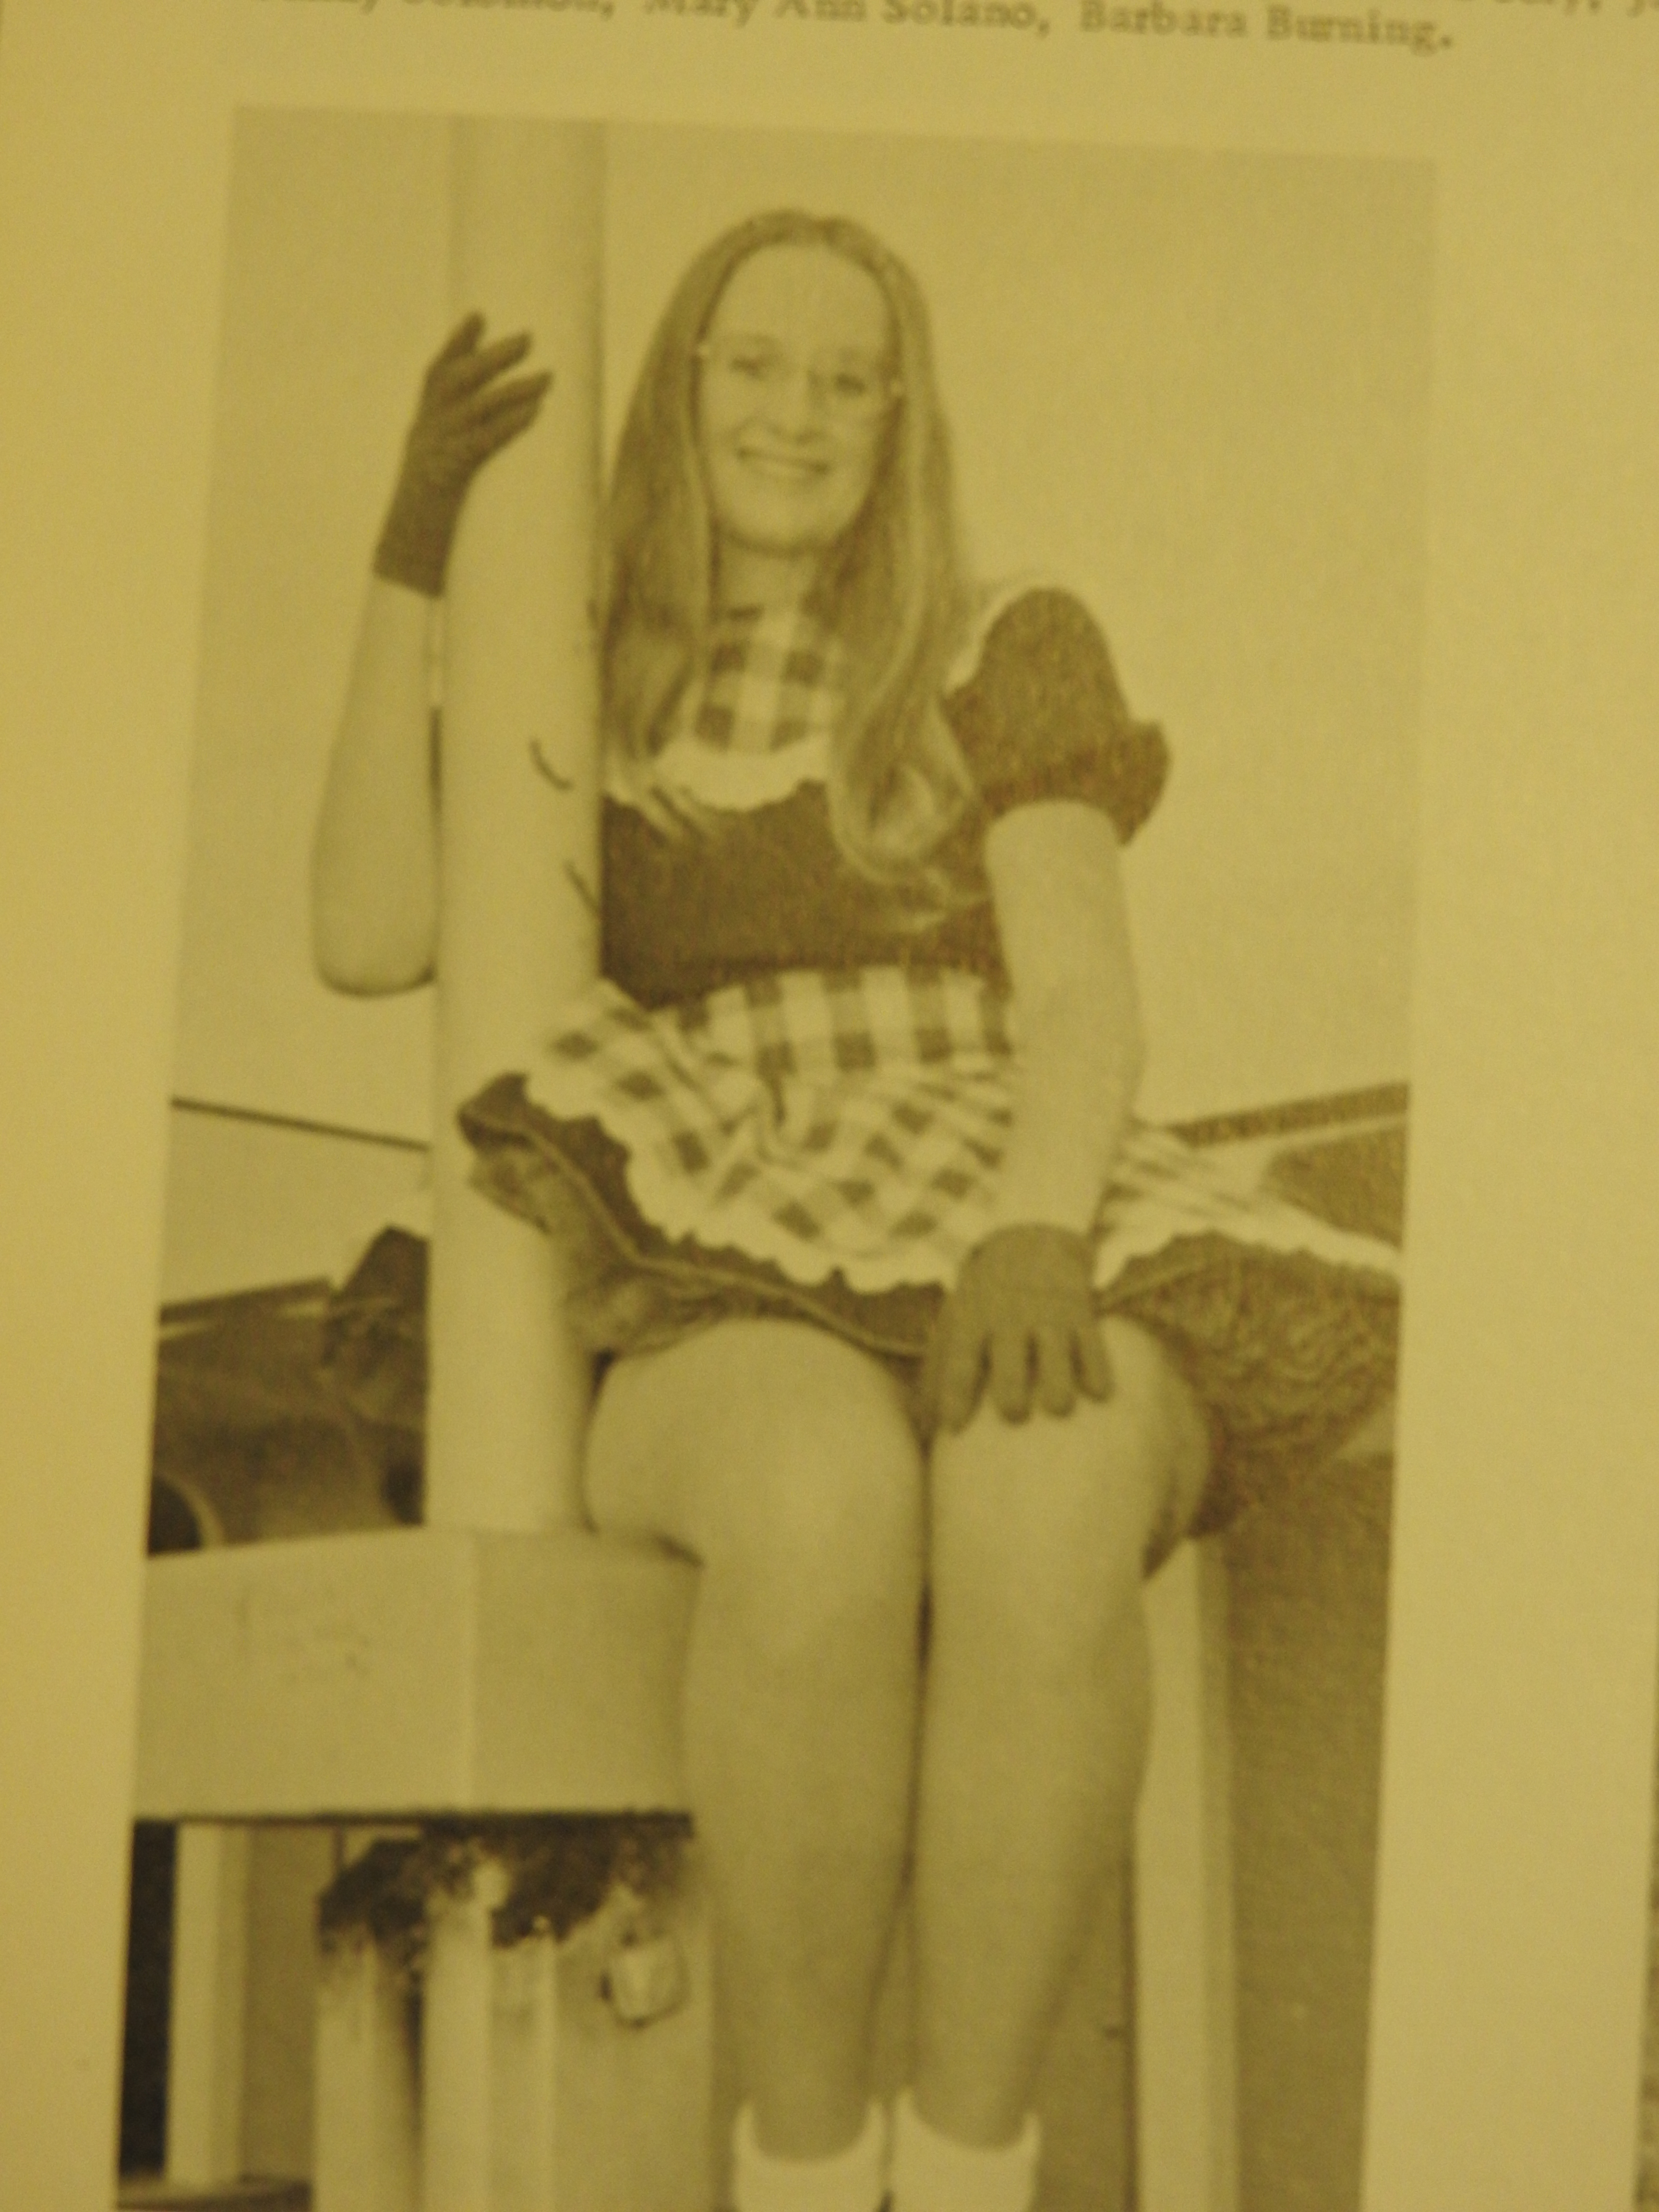 Counts Yearbook